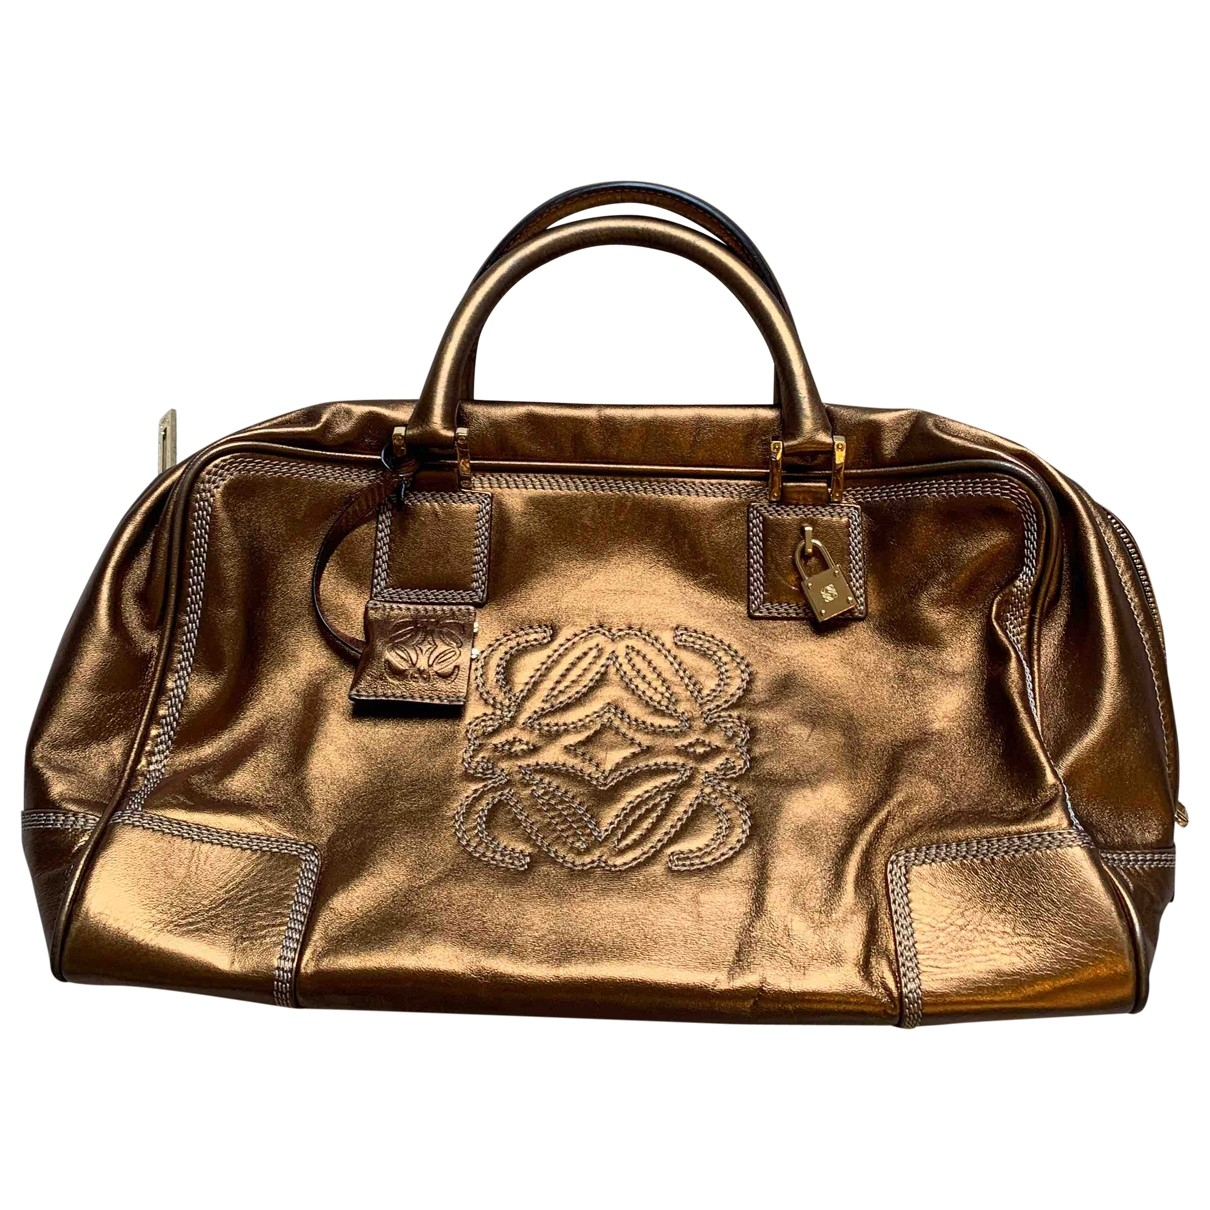 Loewe - Sac a main Amazona pour femme en cuir - metallise